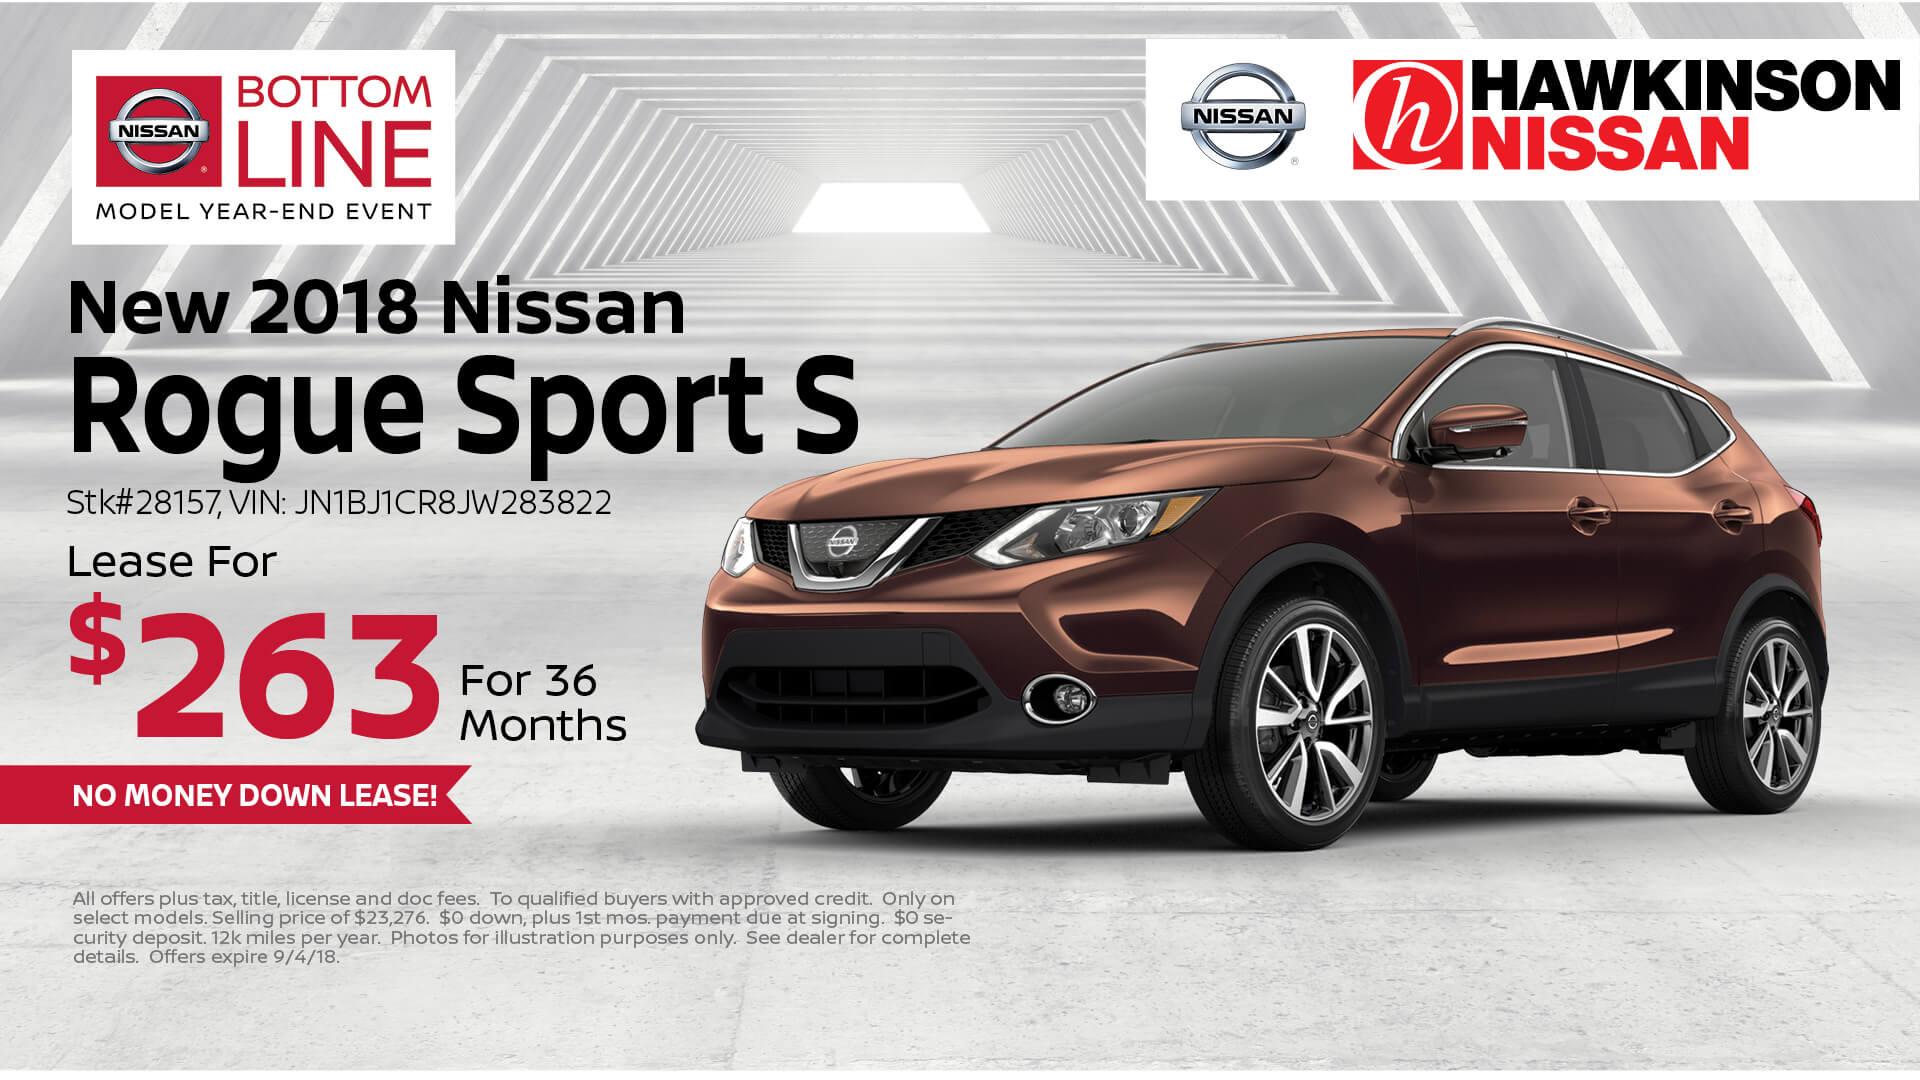 2018 Nissan Rogue Sport Special Offer